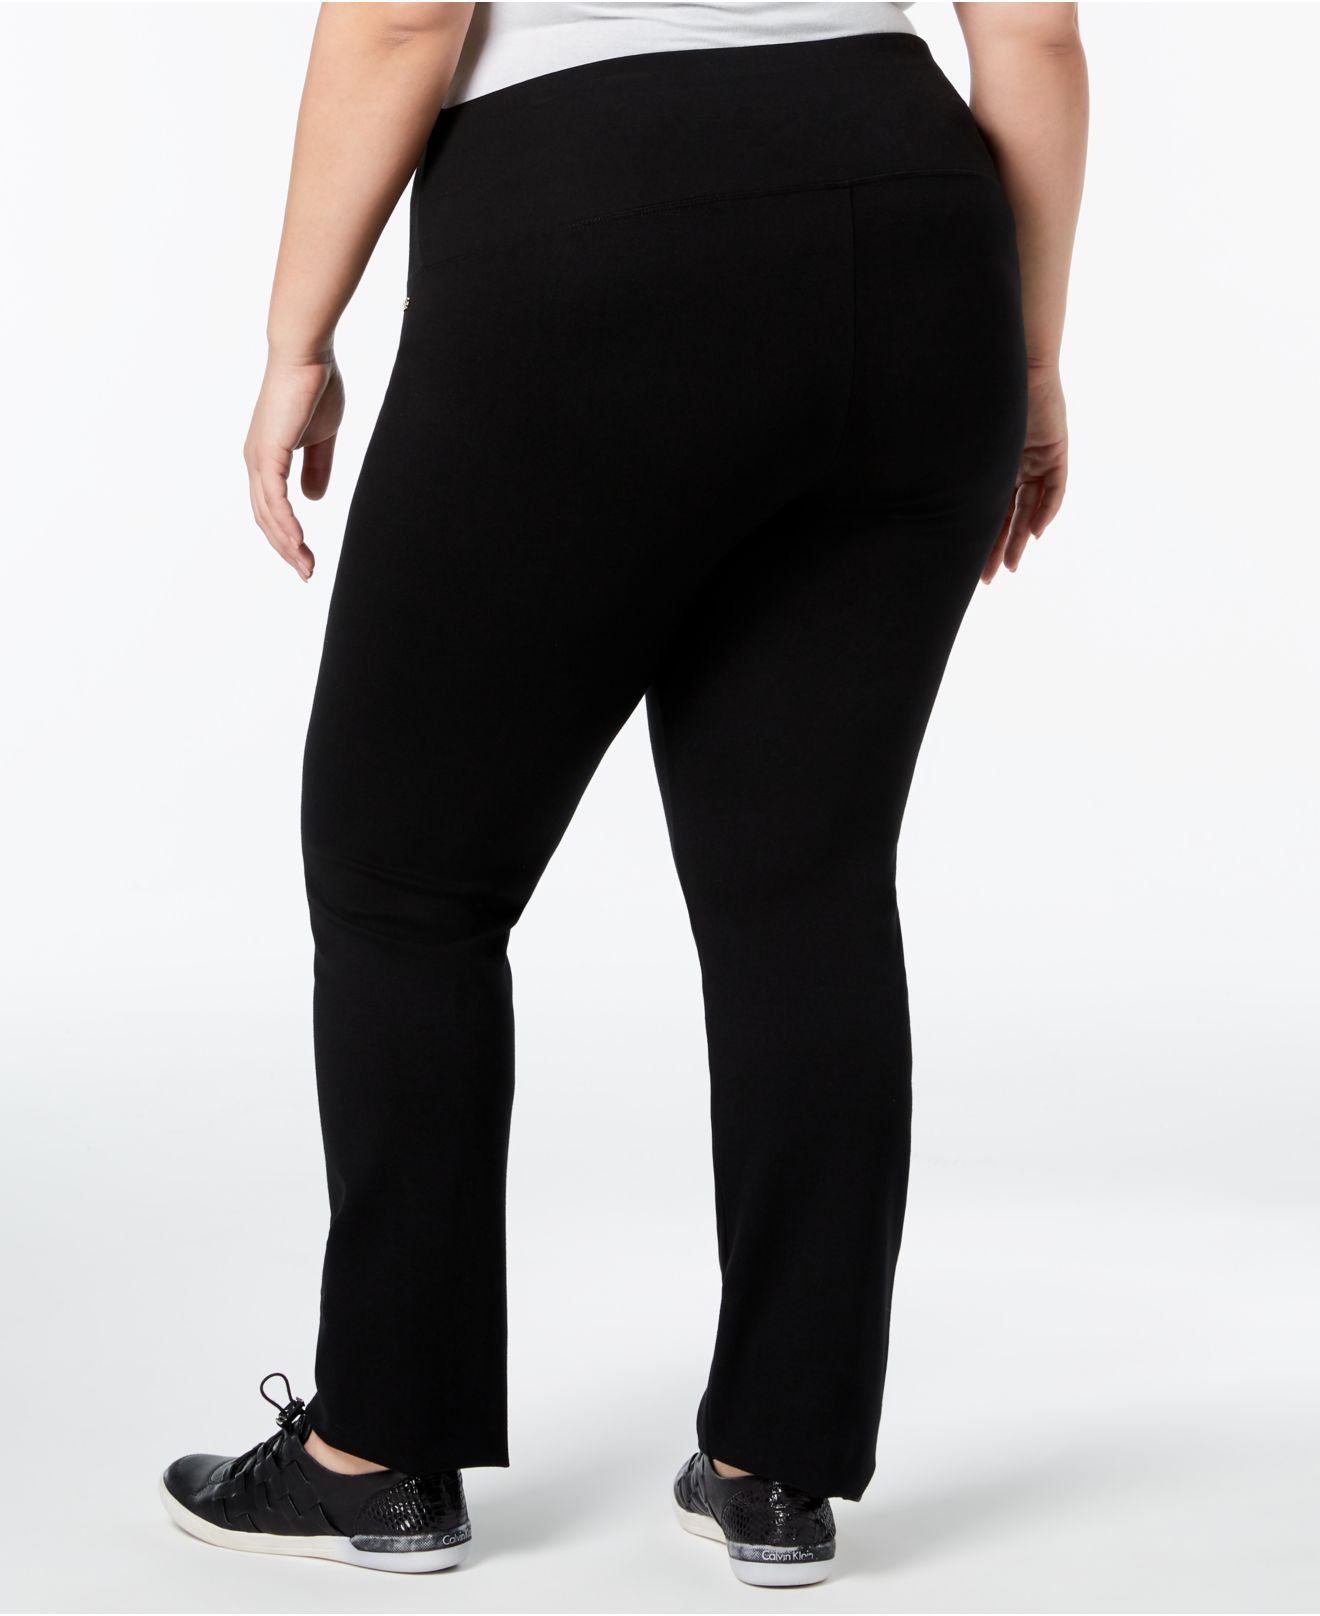 b30d7c3867e Lyst - Calvin Klein Plus Size Pull-on Active Leggings in Black